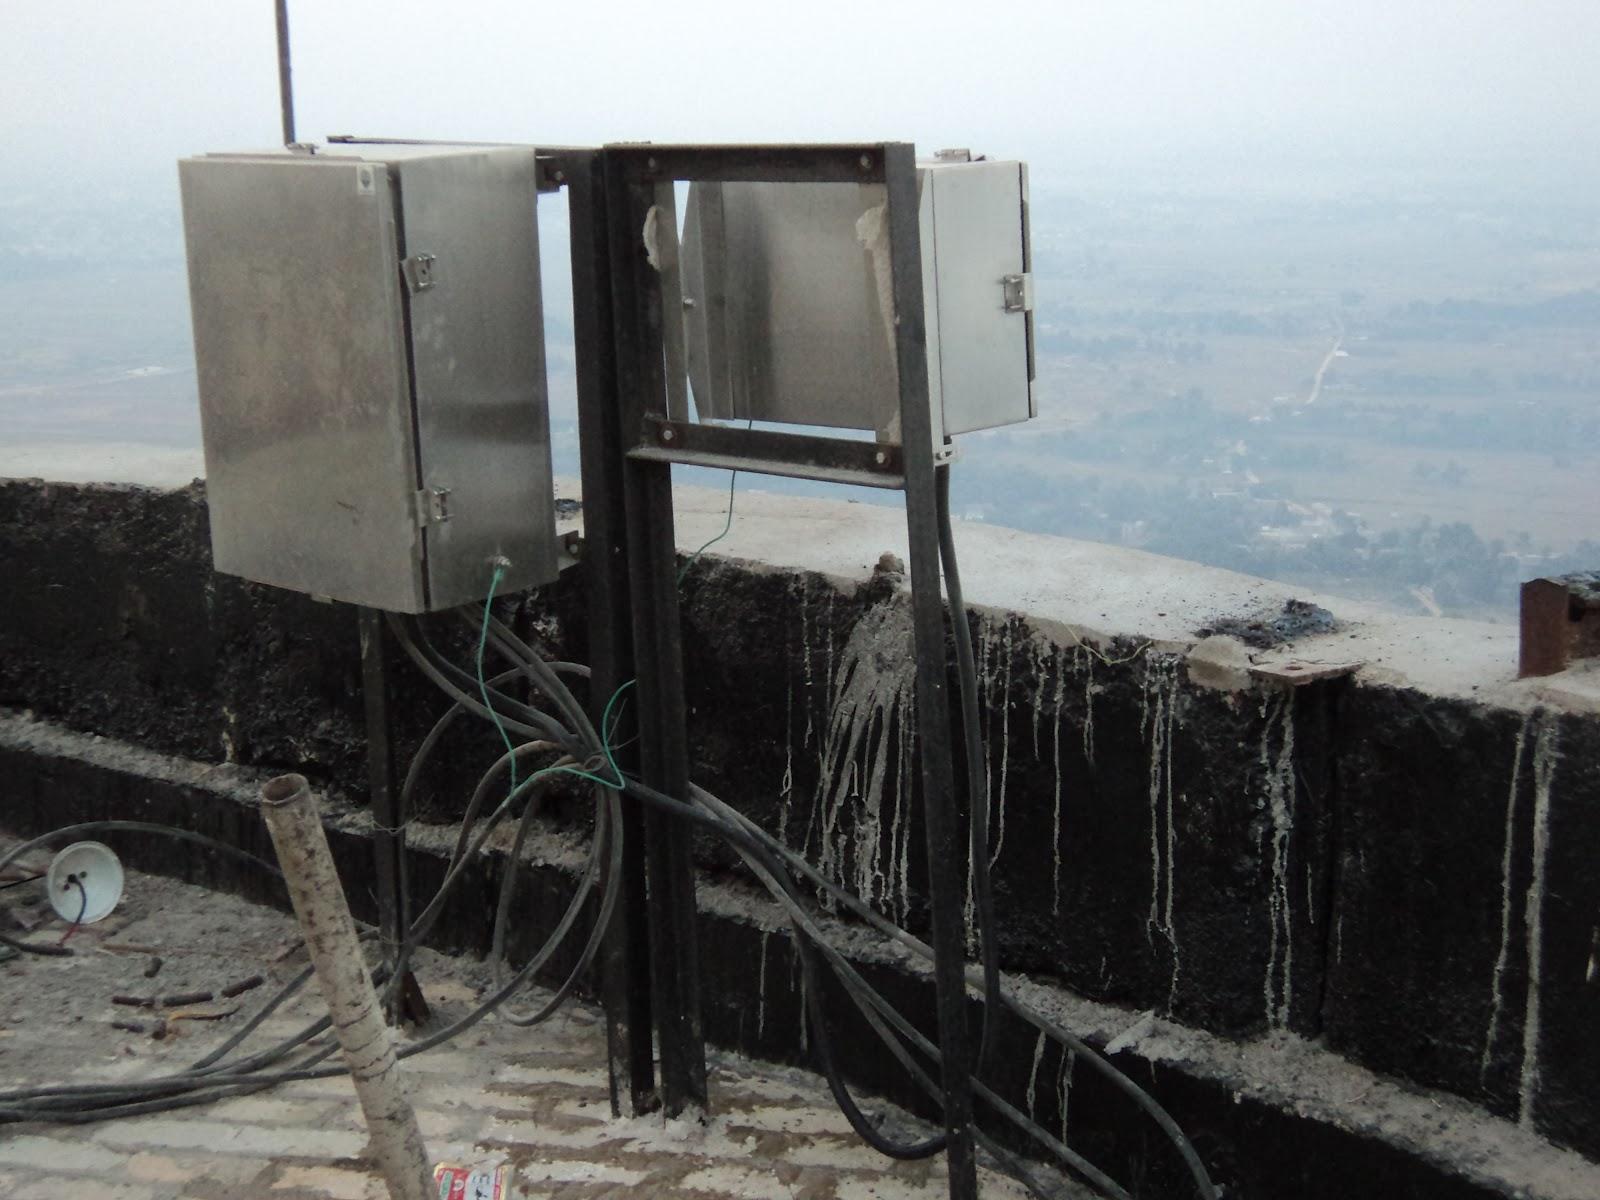 Rcc Chimney Construction : Rcc chimney electrical work